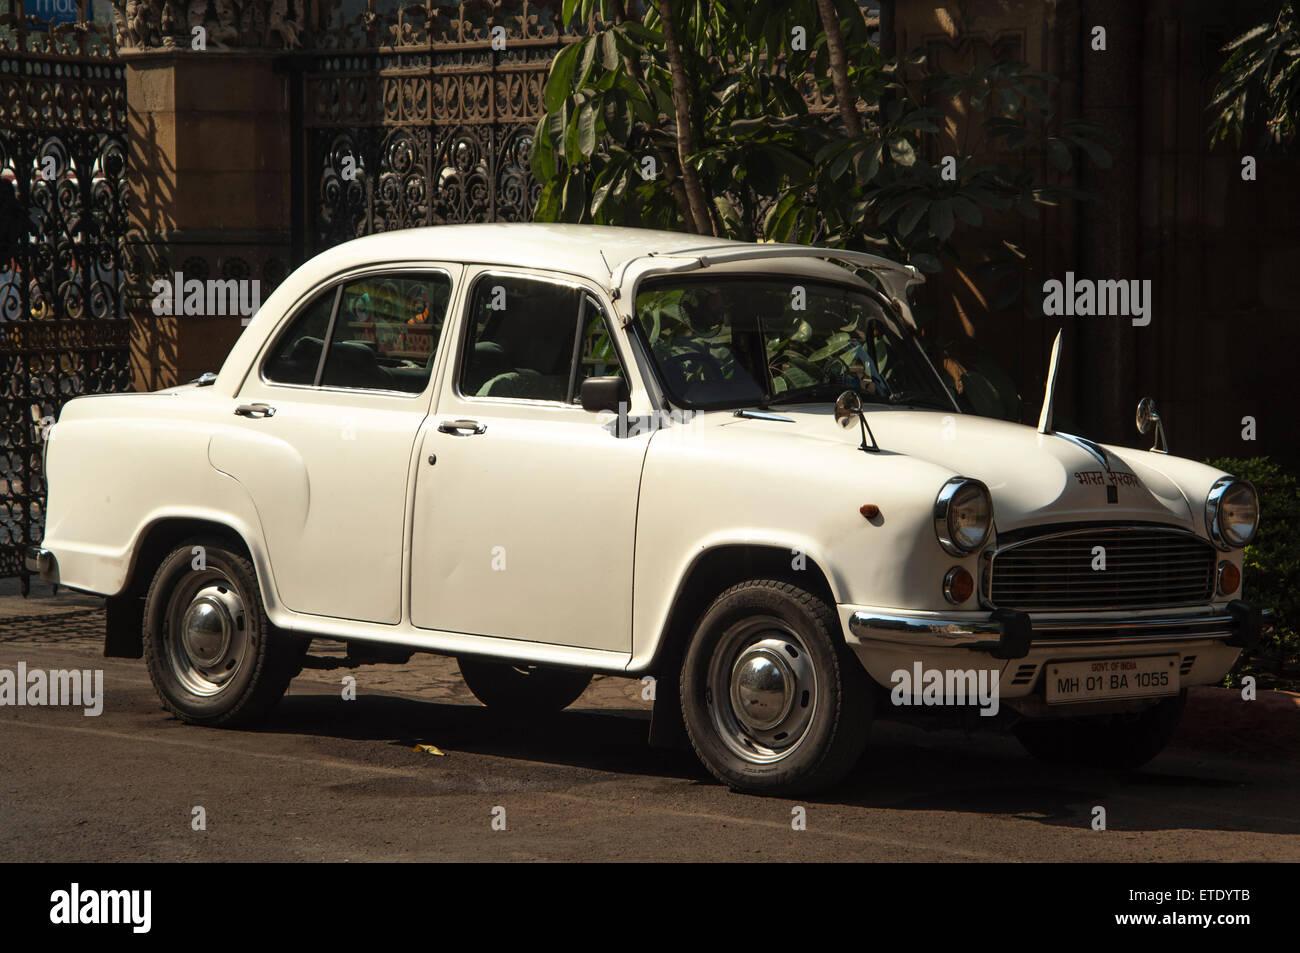 Buy Old Car In Mumbai